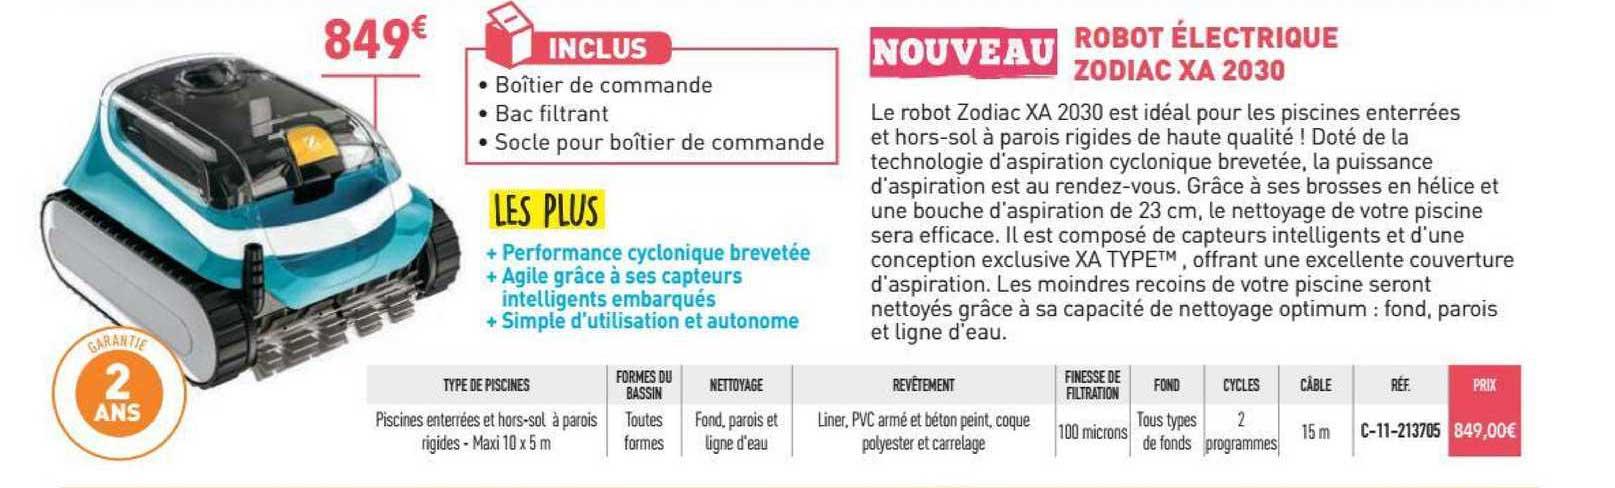 Cash Piscines Robot électrique Zodiac Xa 2030